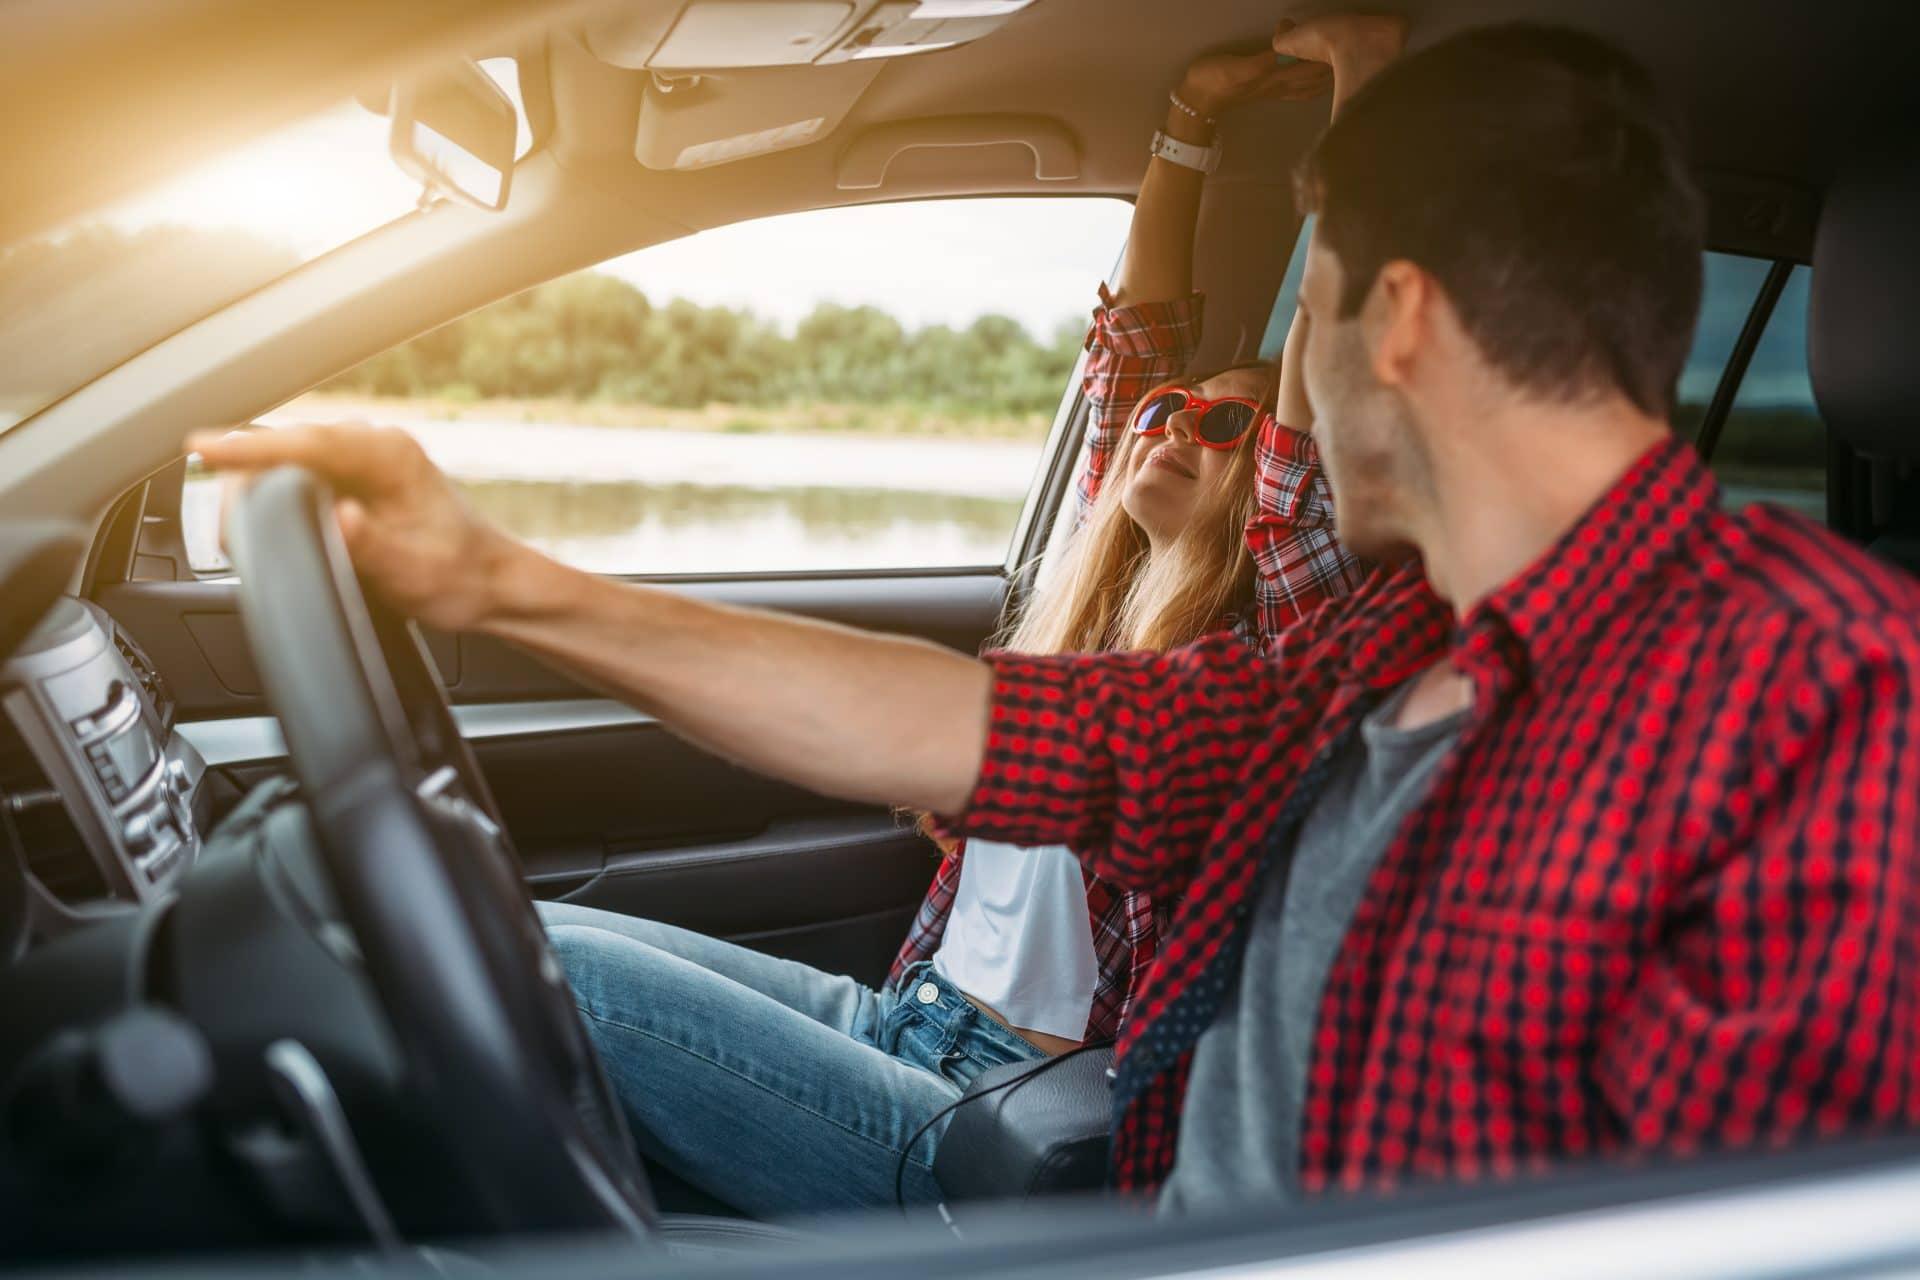 Couple enjoying their self-drive holiday